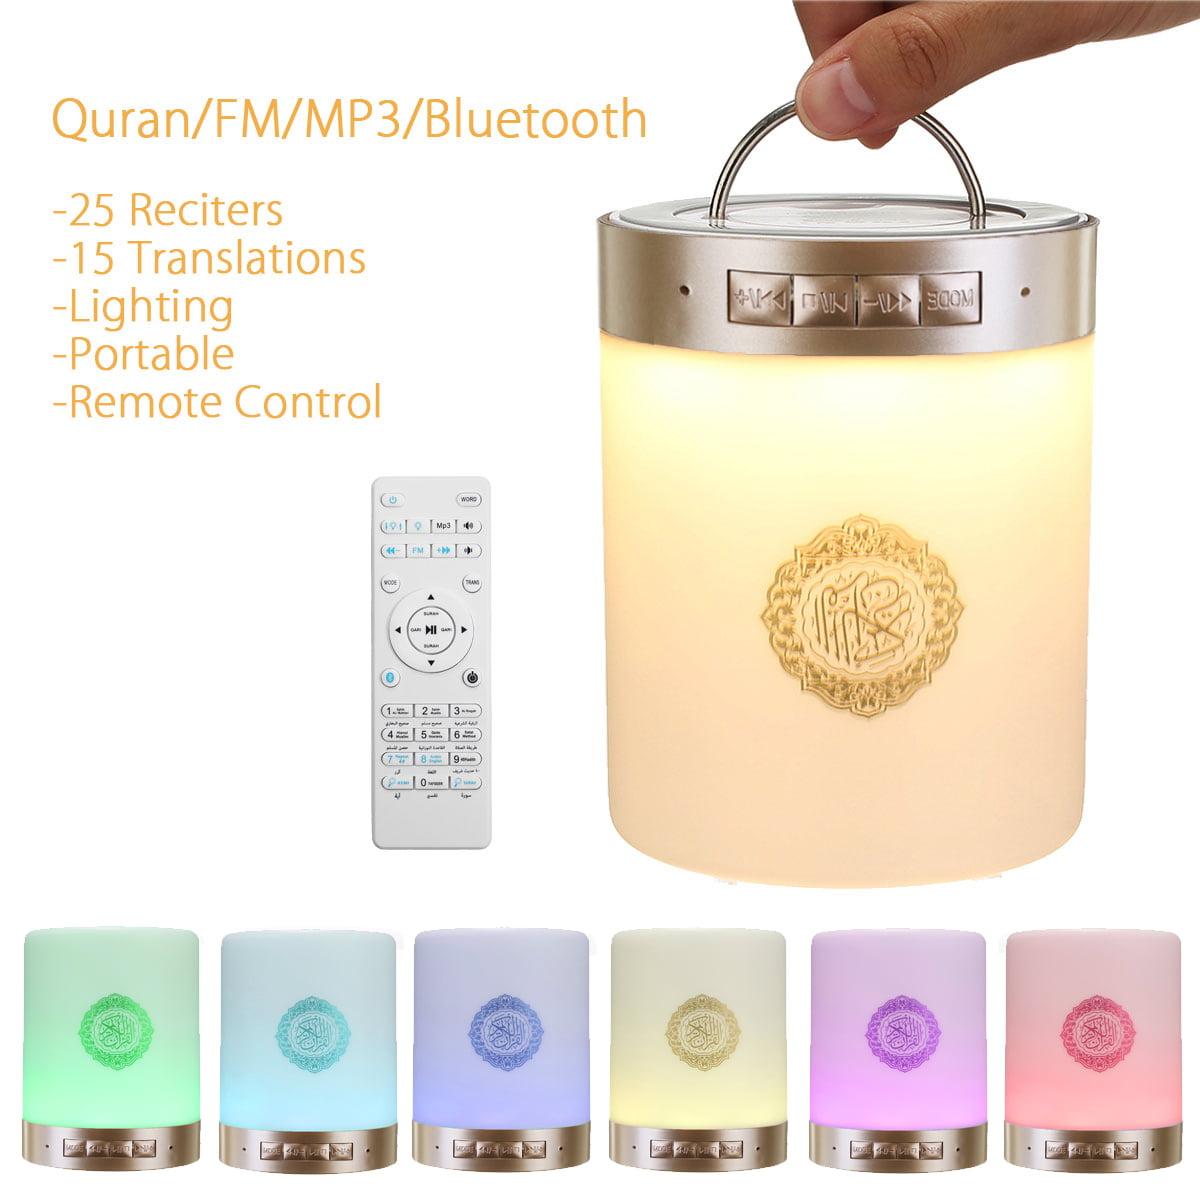 Portable 2in1 Bluetooth Wireless Samrt Quran Speaker Ramadan Islamic Azan Muslim Player Remote Control LED Touch Lamp Night Light